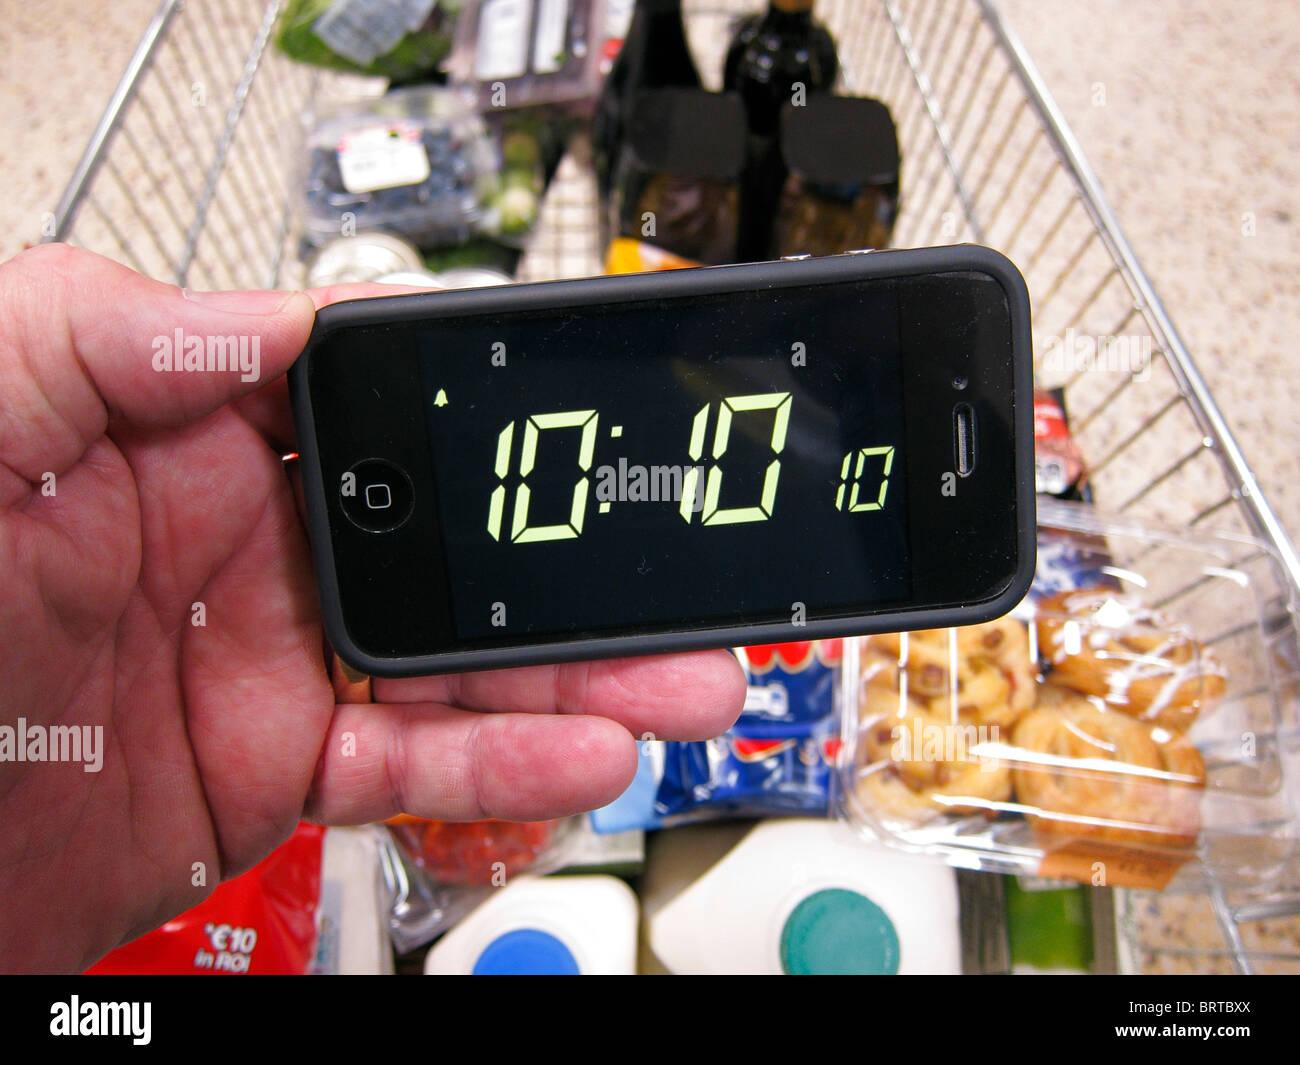 Travel Comp Time Calculator